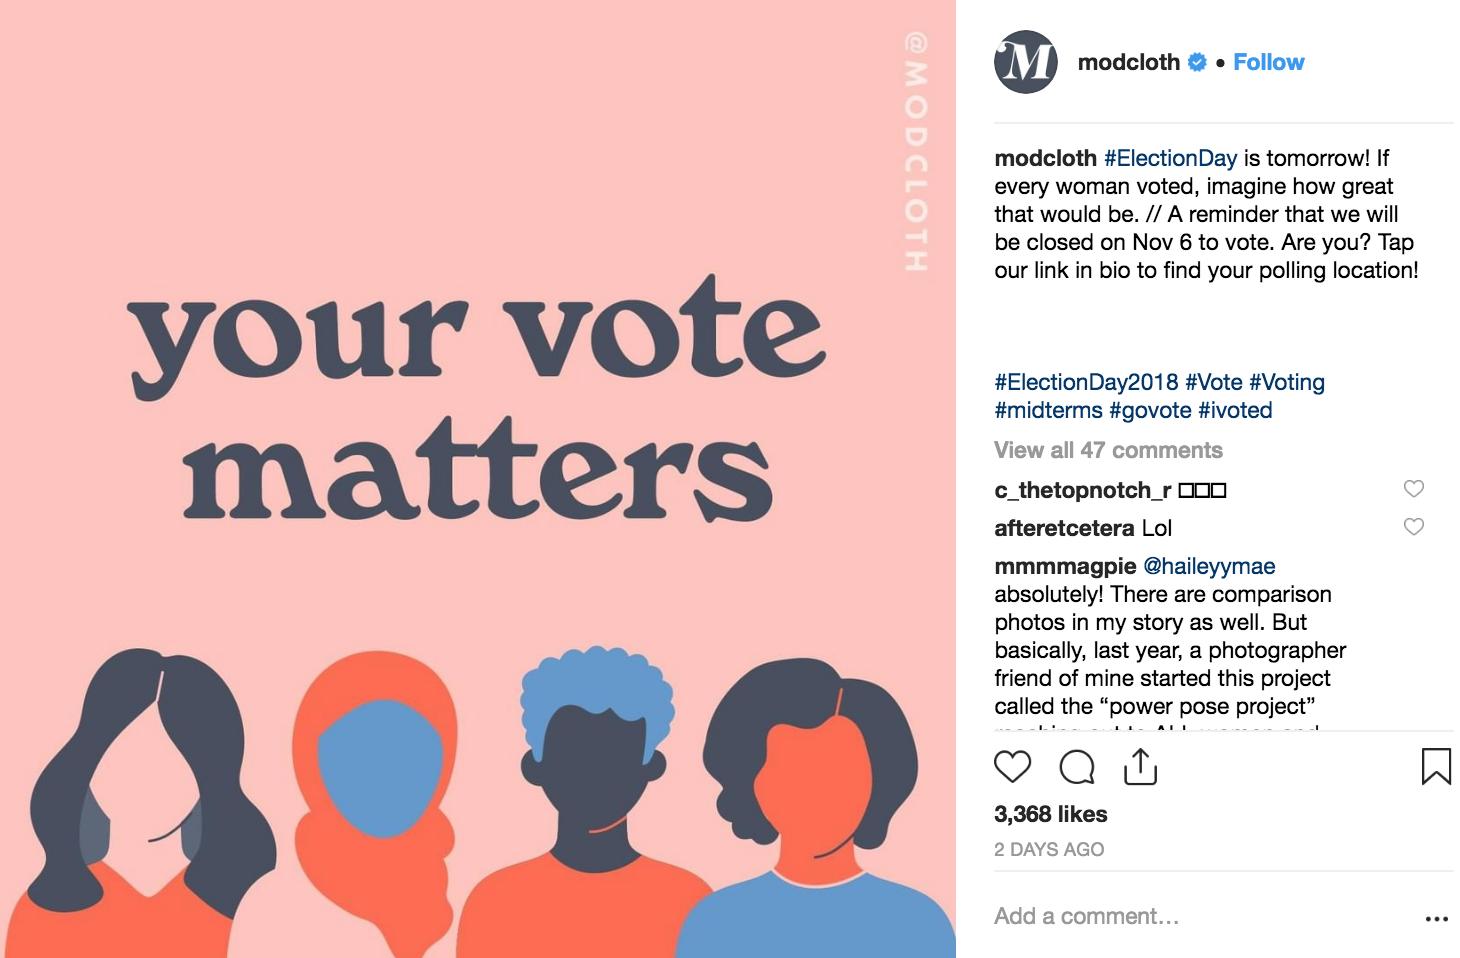 election-day-instagram-strategy-modcloth.jpg